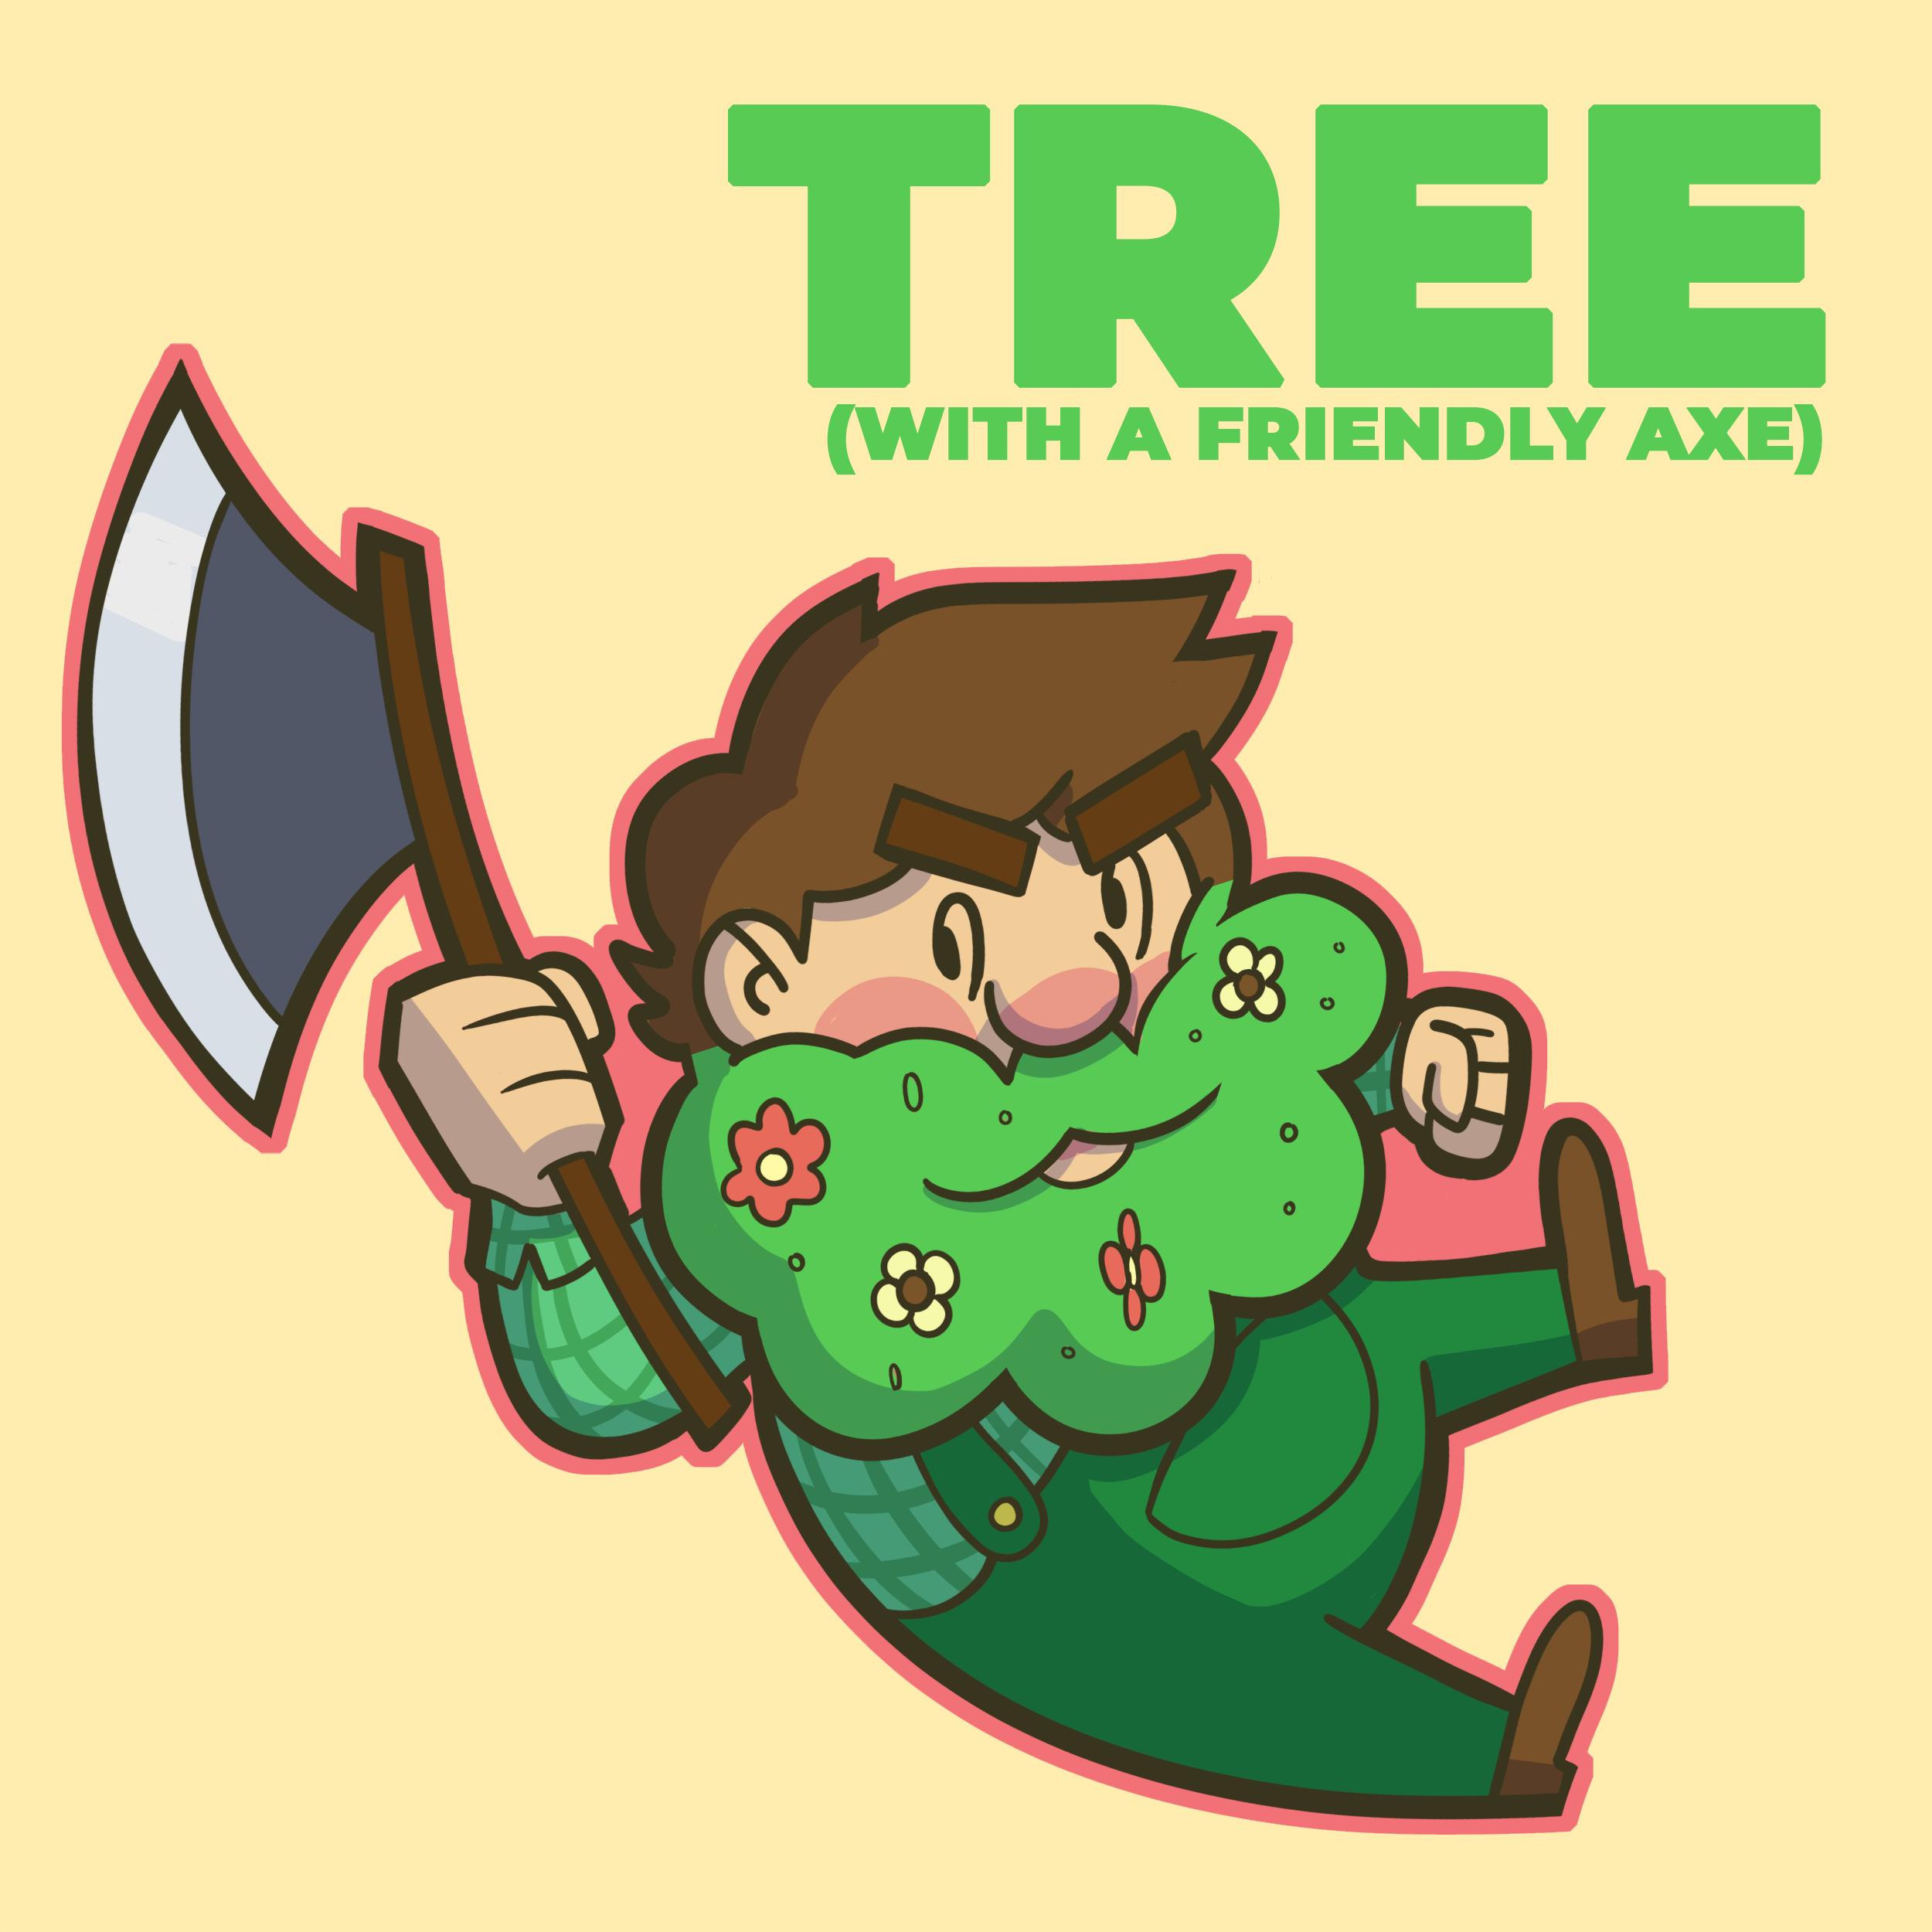 TREE'S BIRTHDAY.